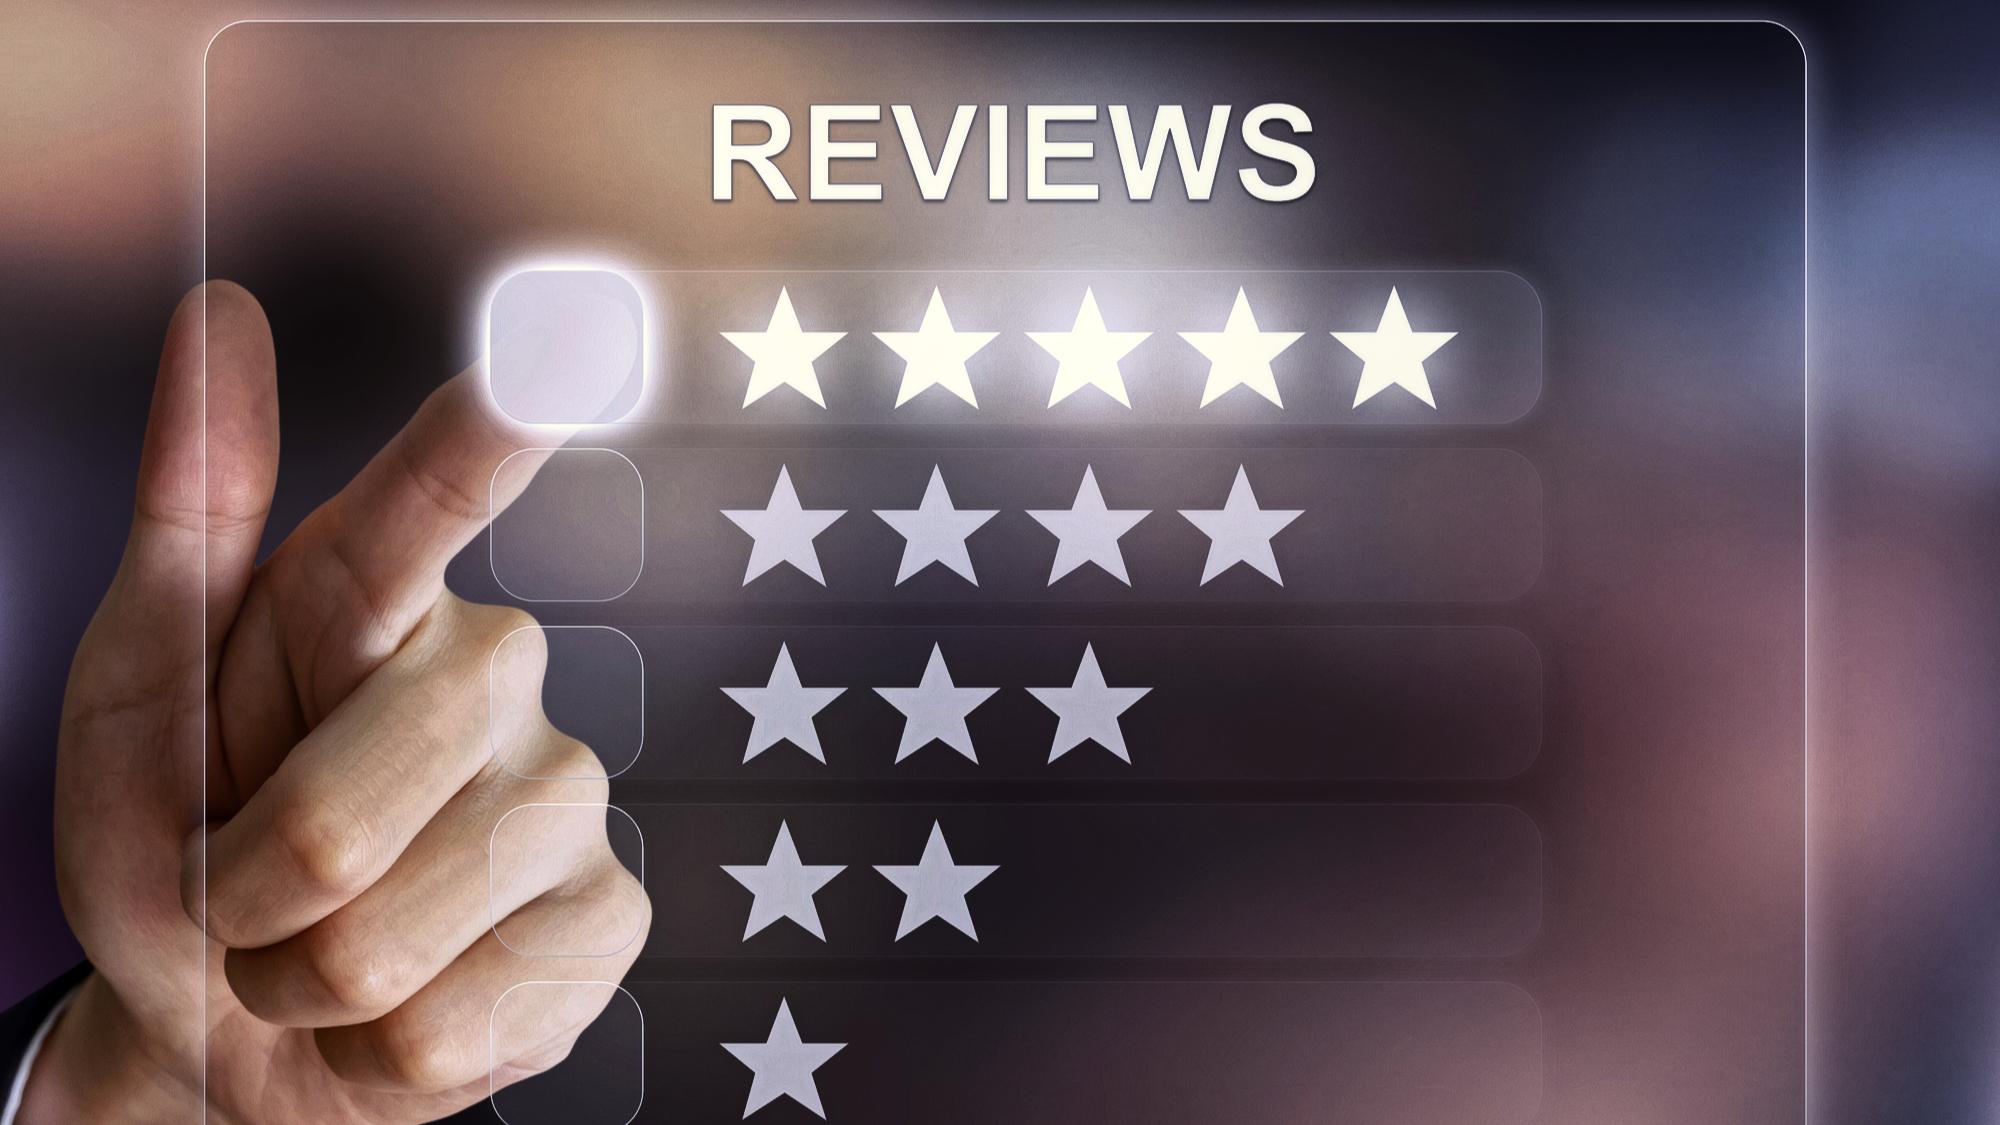 Getting Customer Reviews